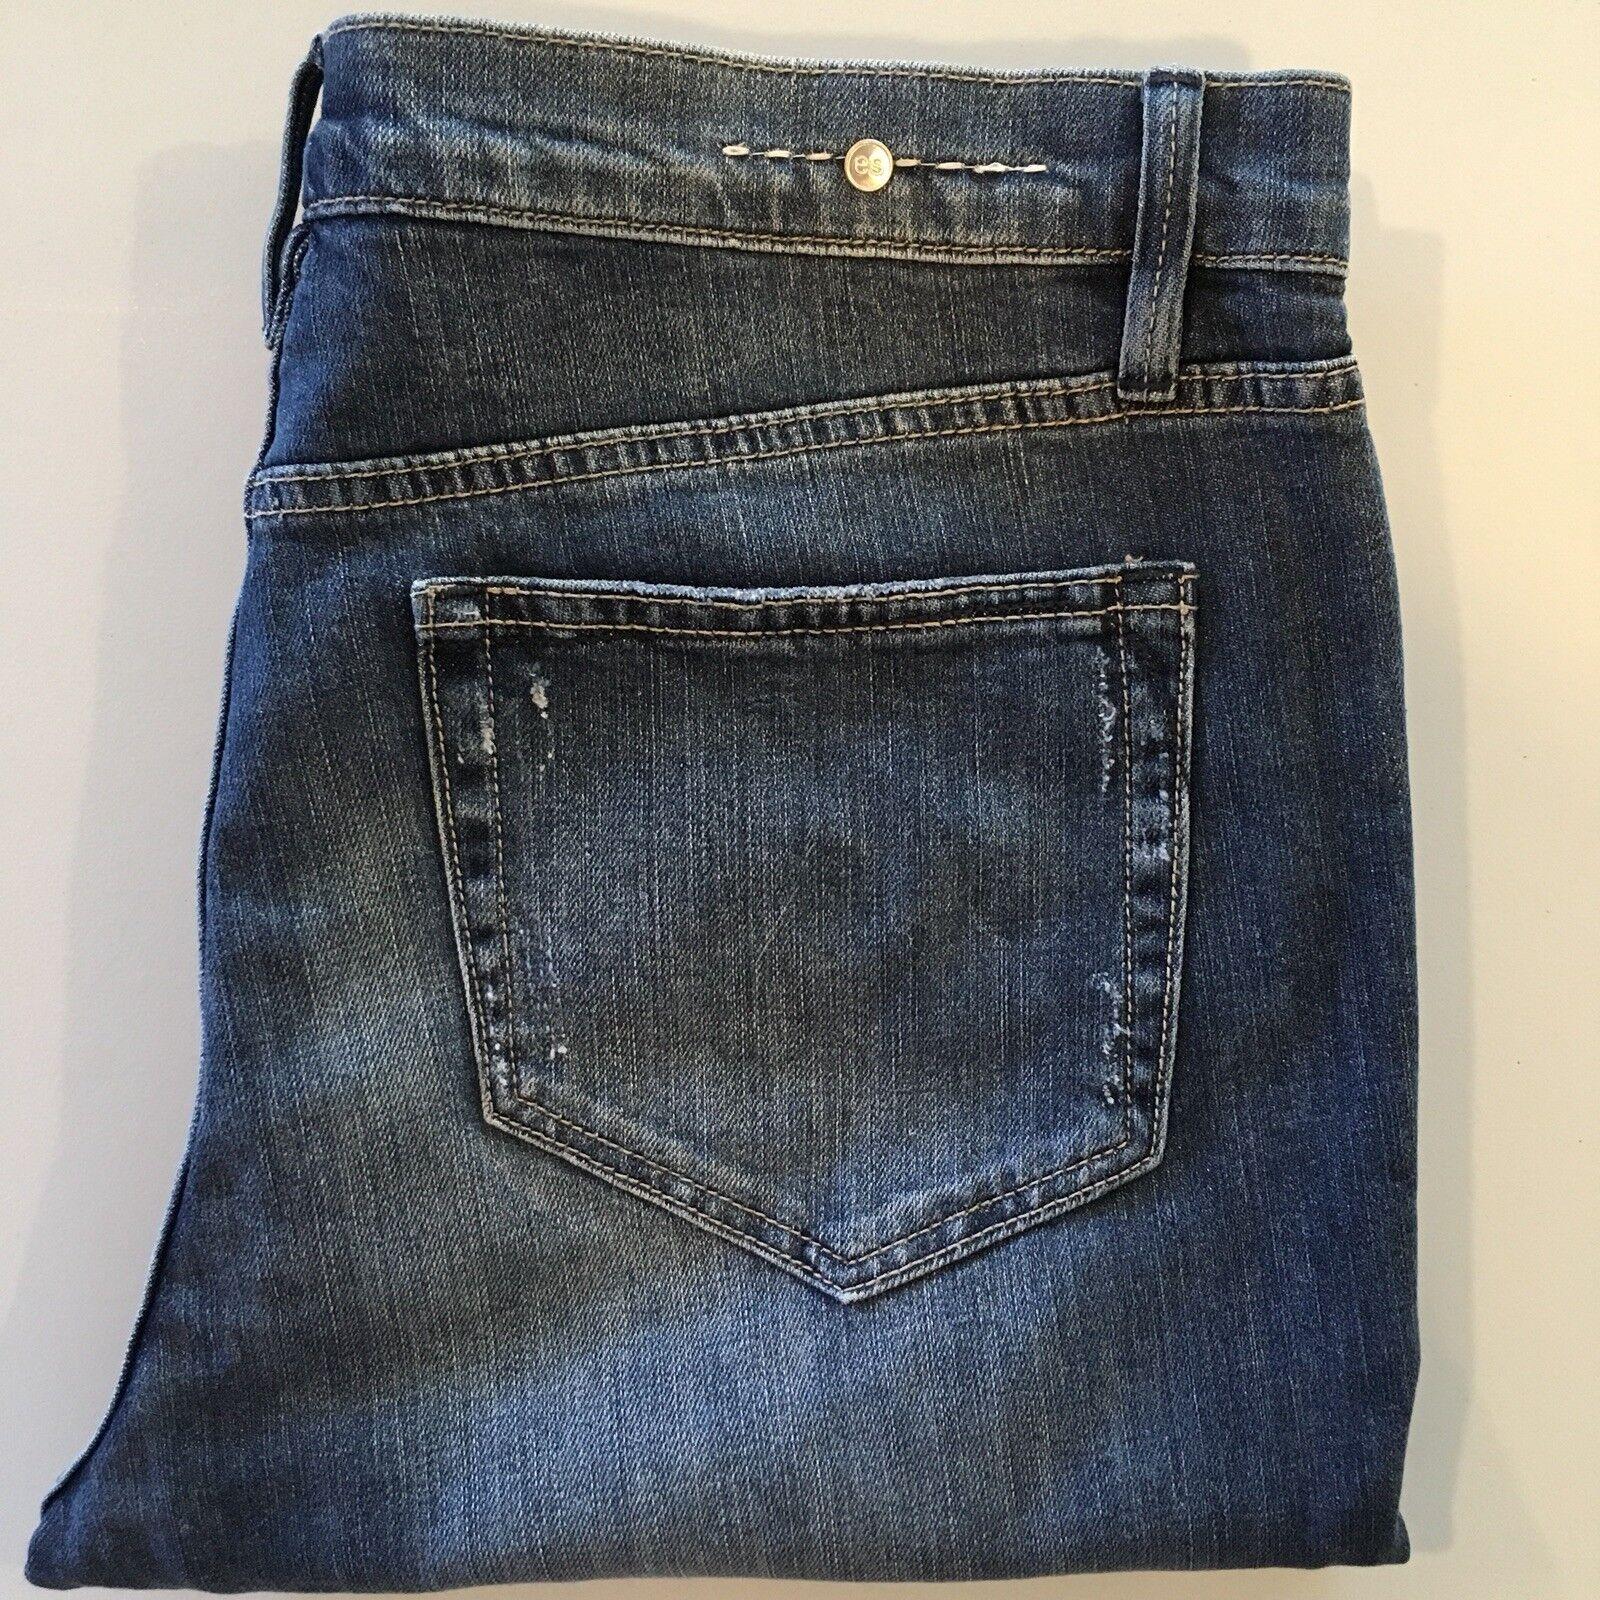 Earnest sewn Blake H.W skinny  Factory distressed jeans (READ BELOW) Size 30